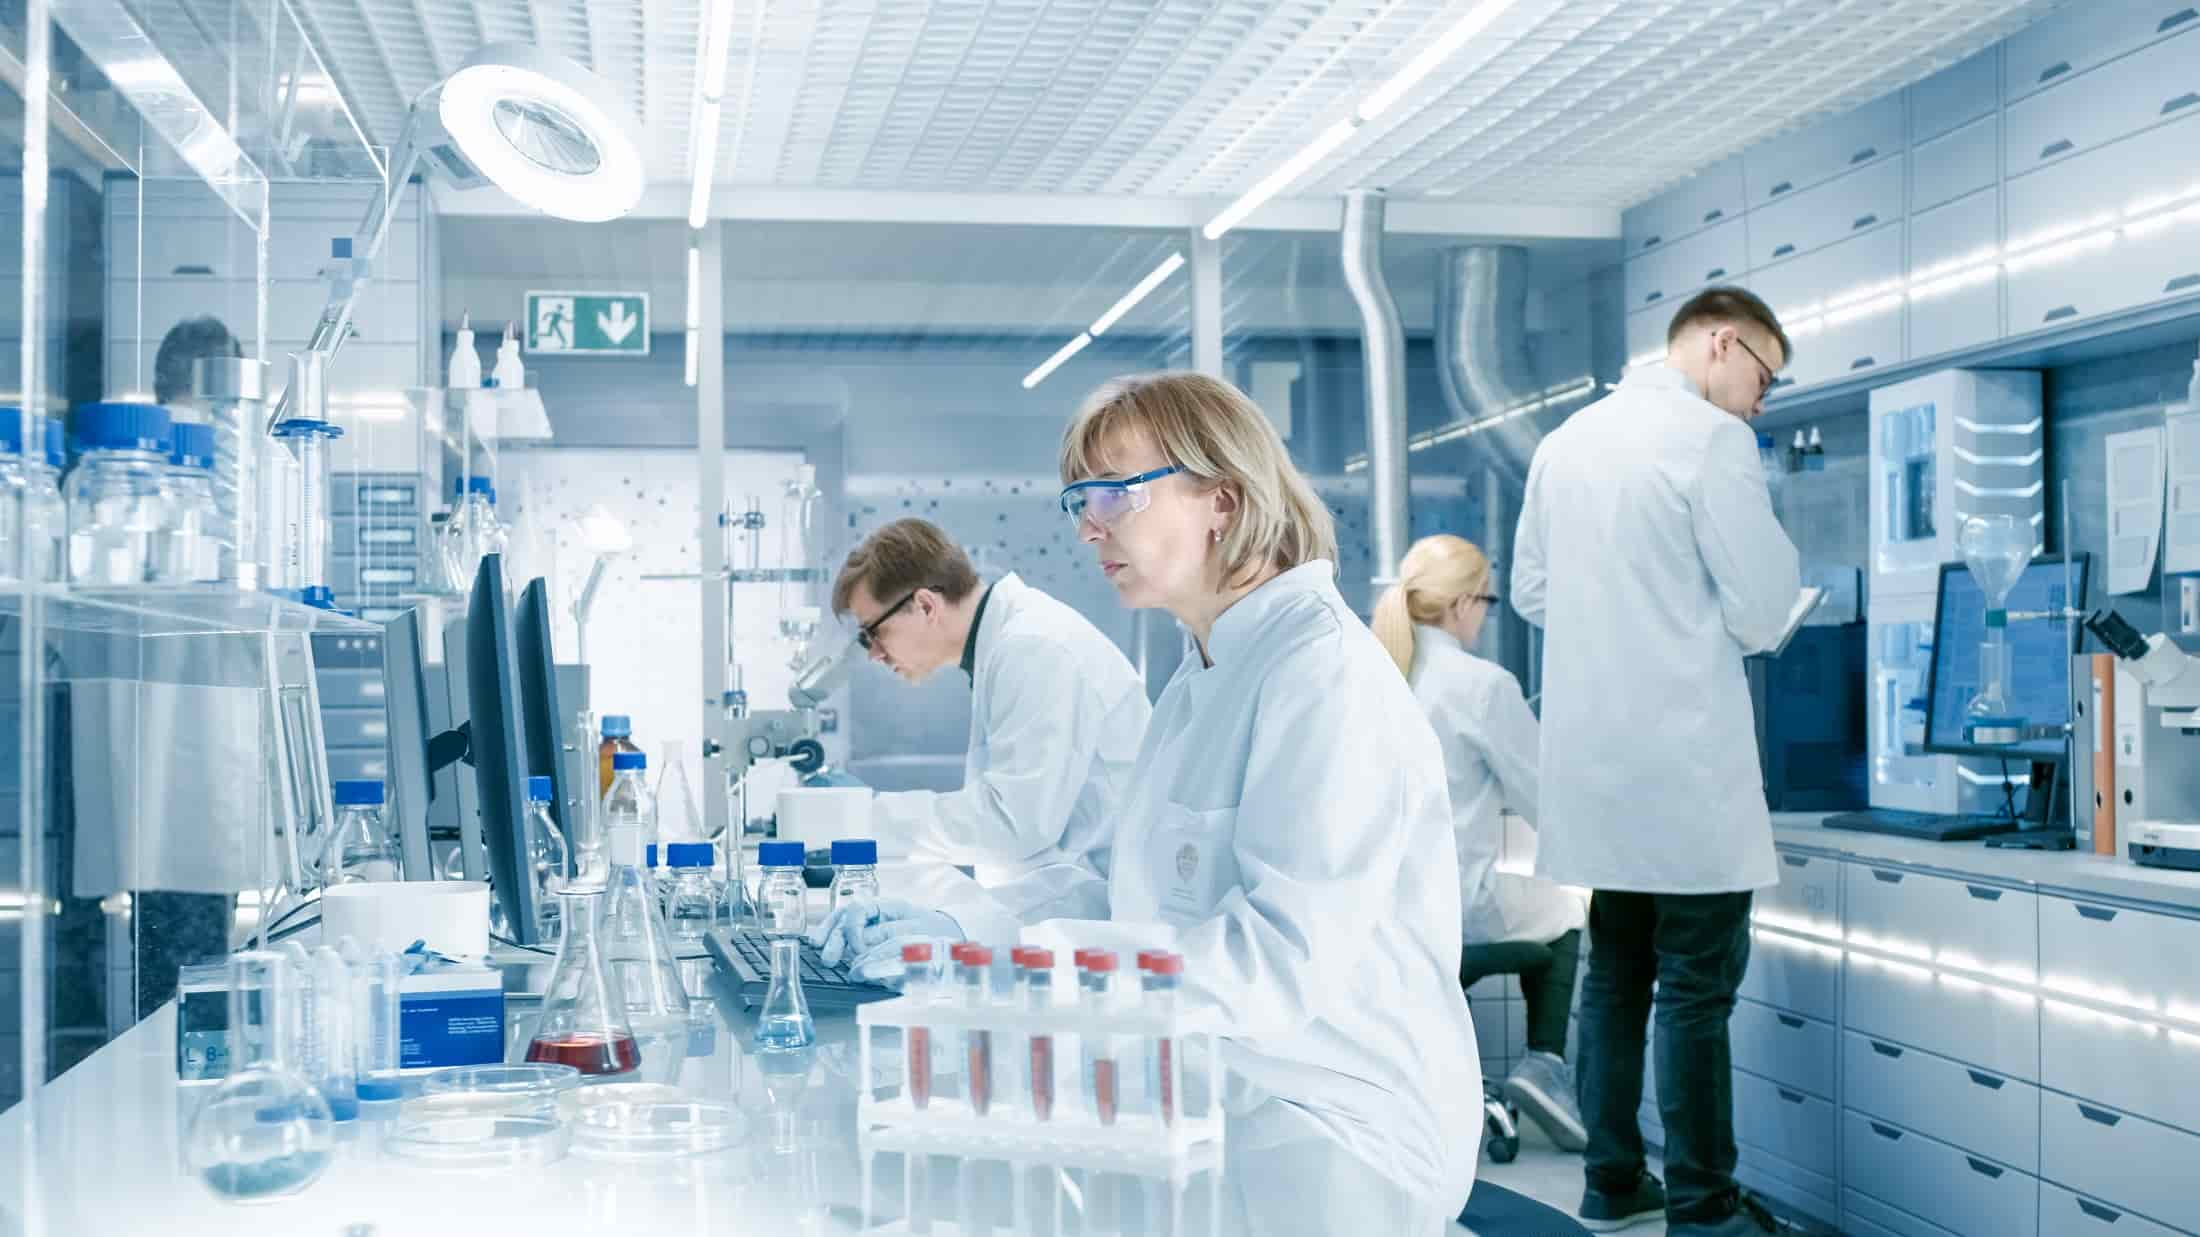 Using the Australian Dangerous Goods Code (ADG Code) when identifying chemical hazards